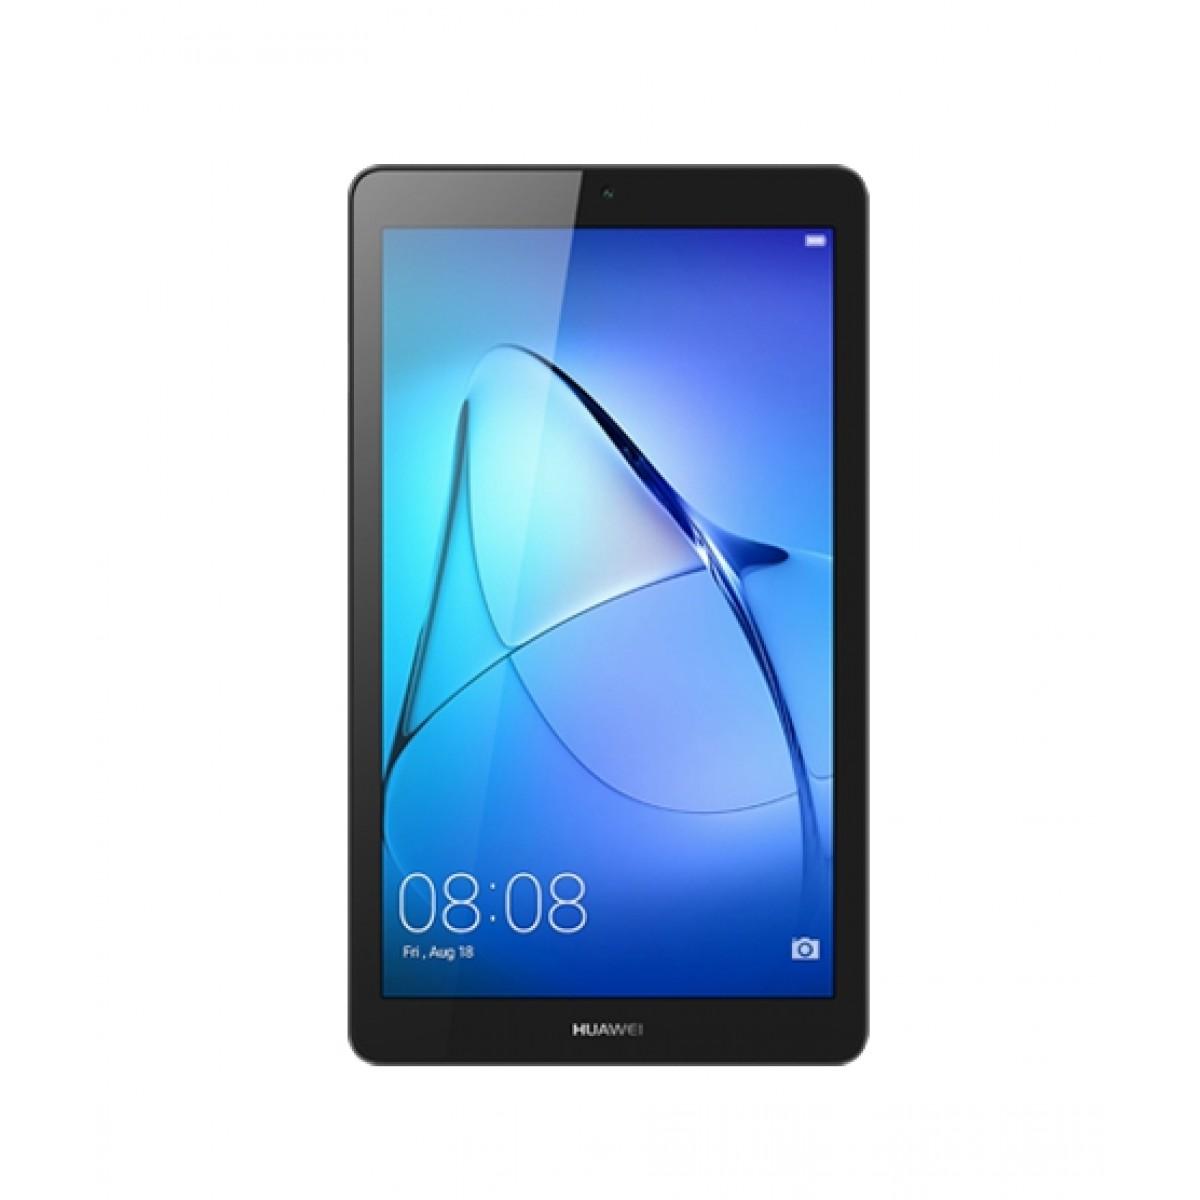 "Huawei MediaPad T3 7"" 8GB WiFi Grey"